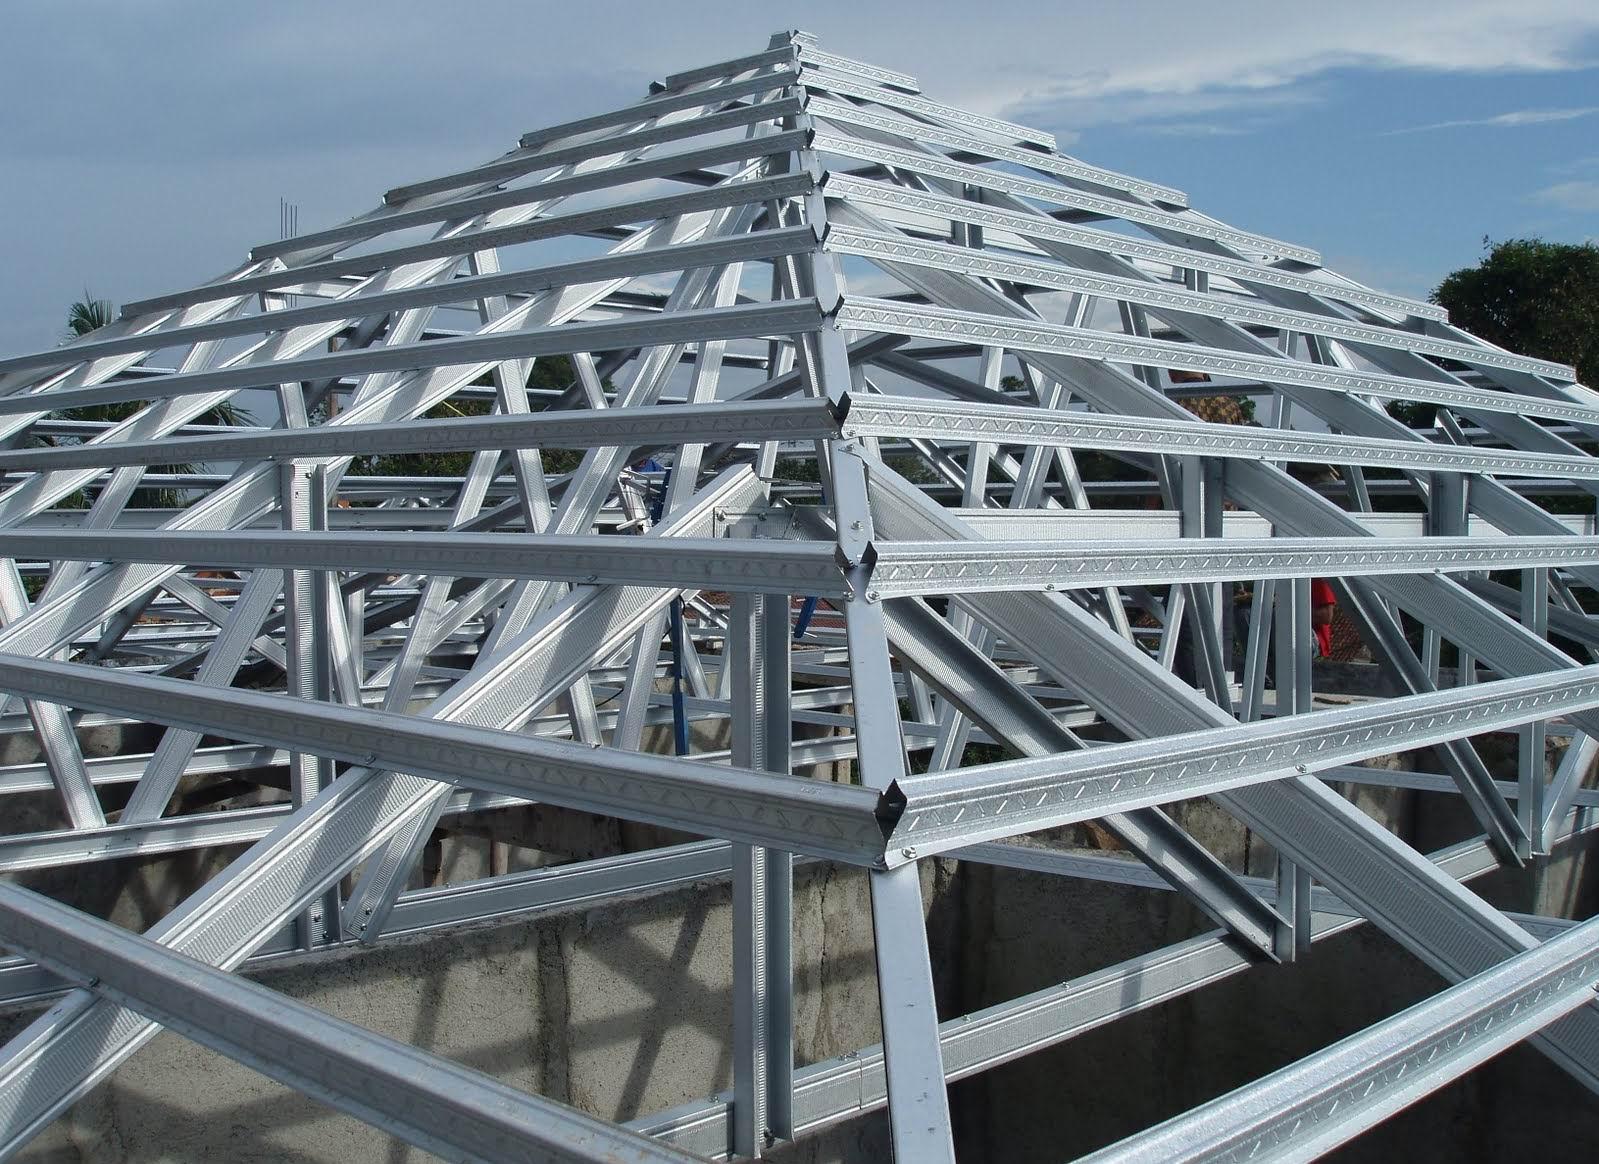 Mari Menghitung Harga Atap Baja Ringan Sesuai Penggunaan Artikel Spacestock